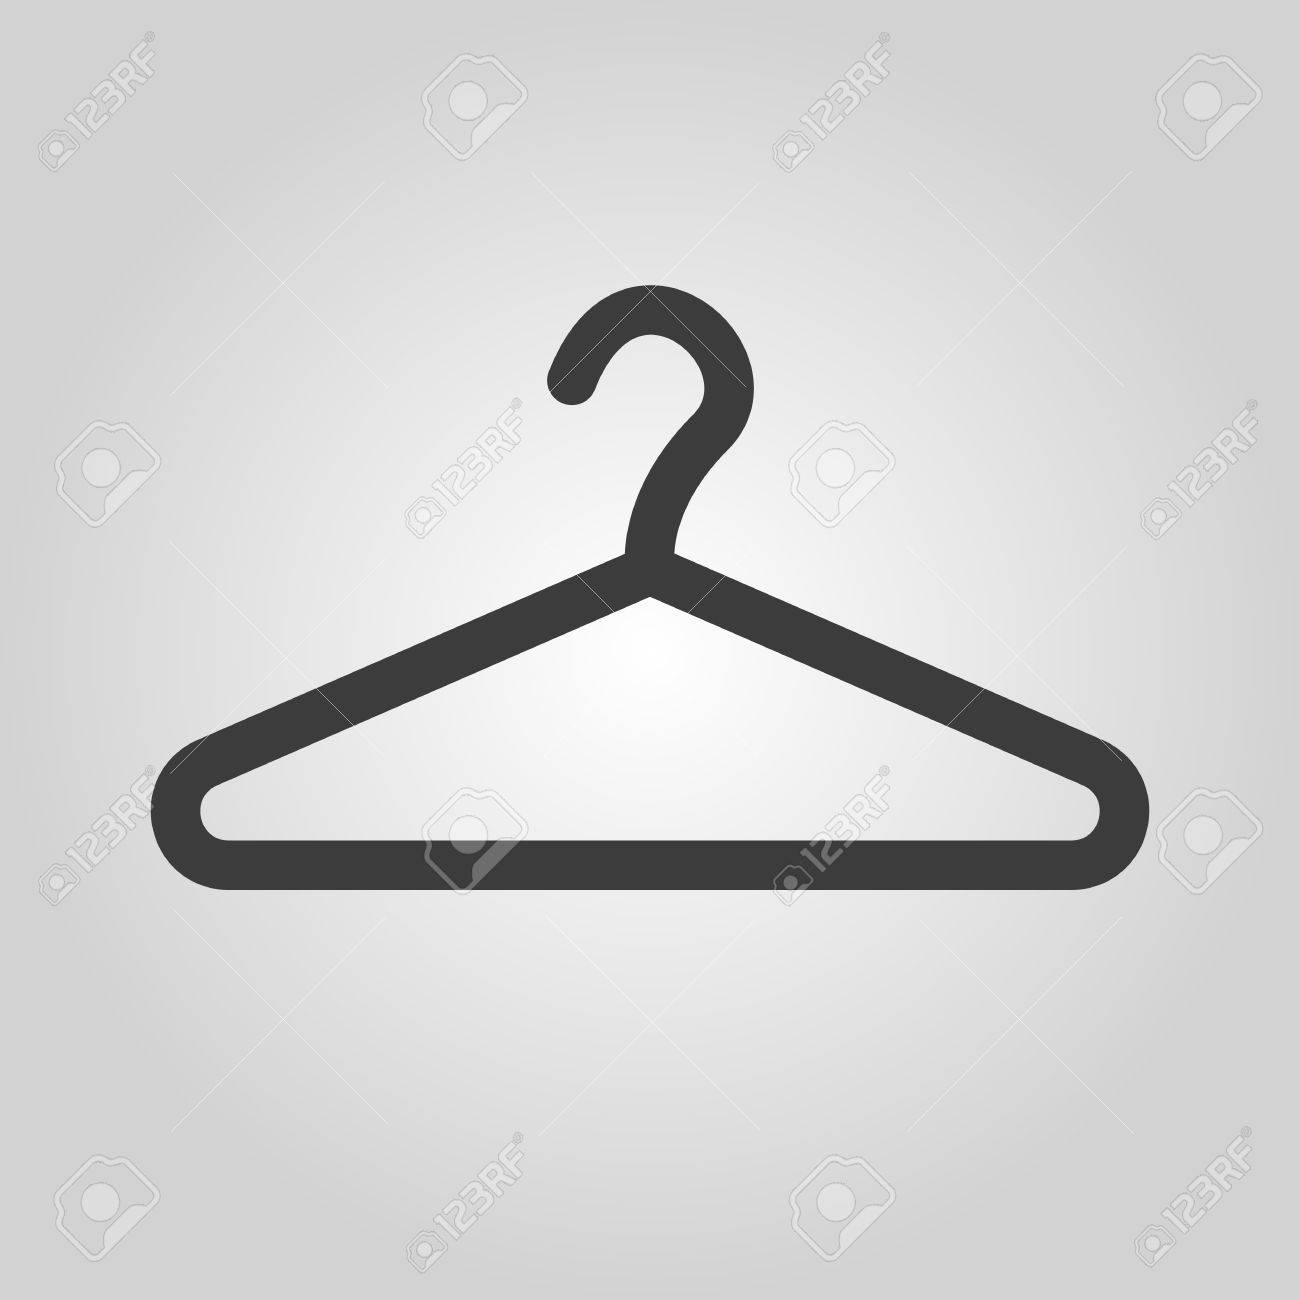 The hanger icon coat rack symbol flat vector illustration the hanger icon coat rack symbol flat vector illustration stock vector 42395168 buycottarizona